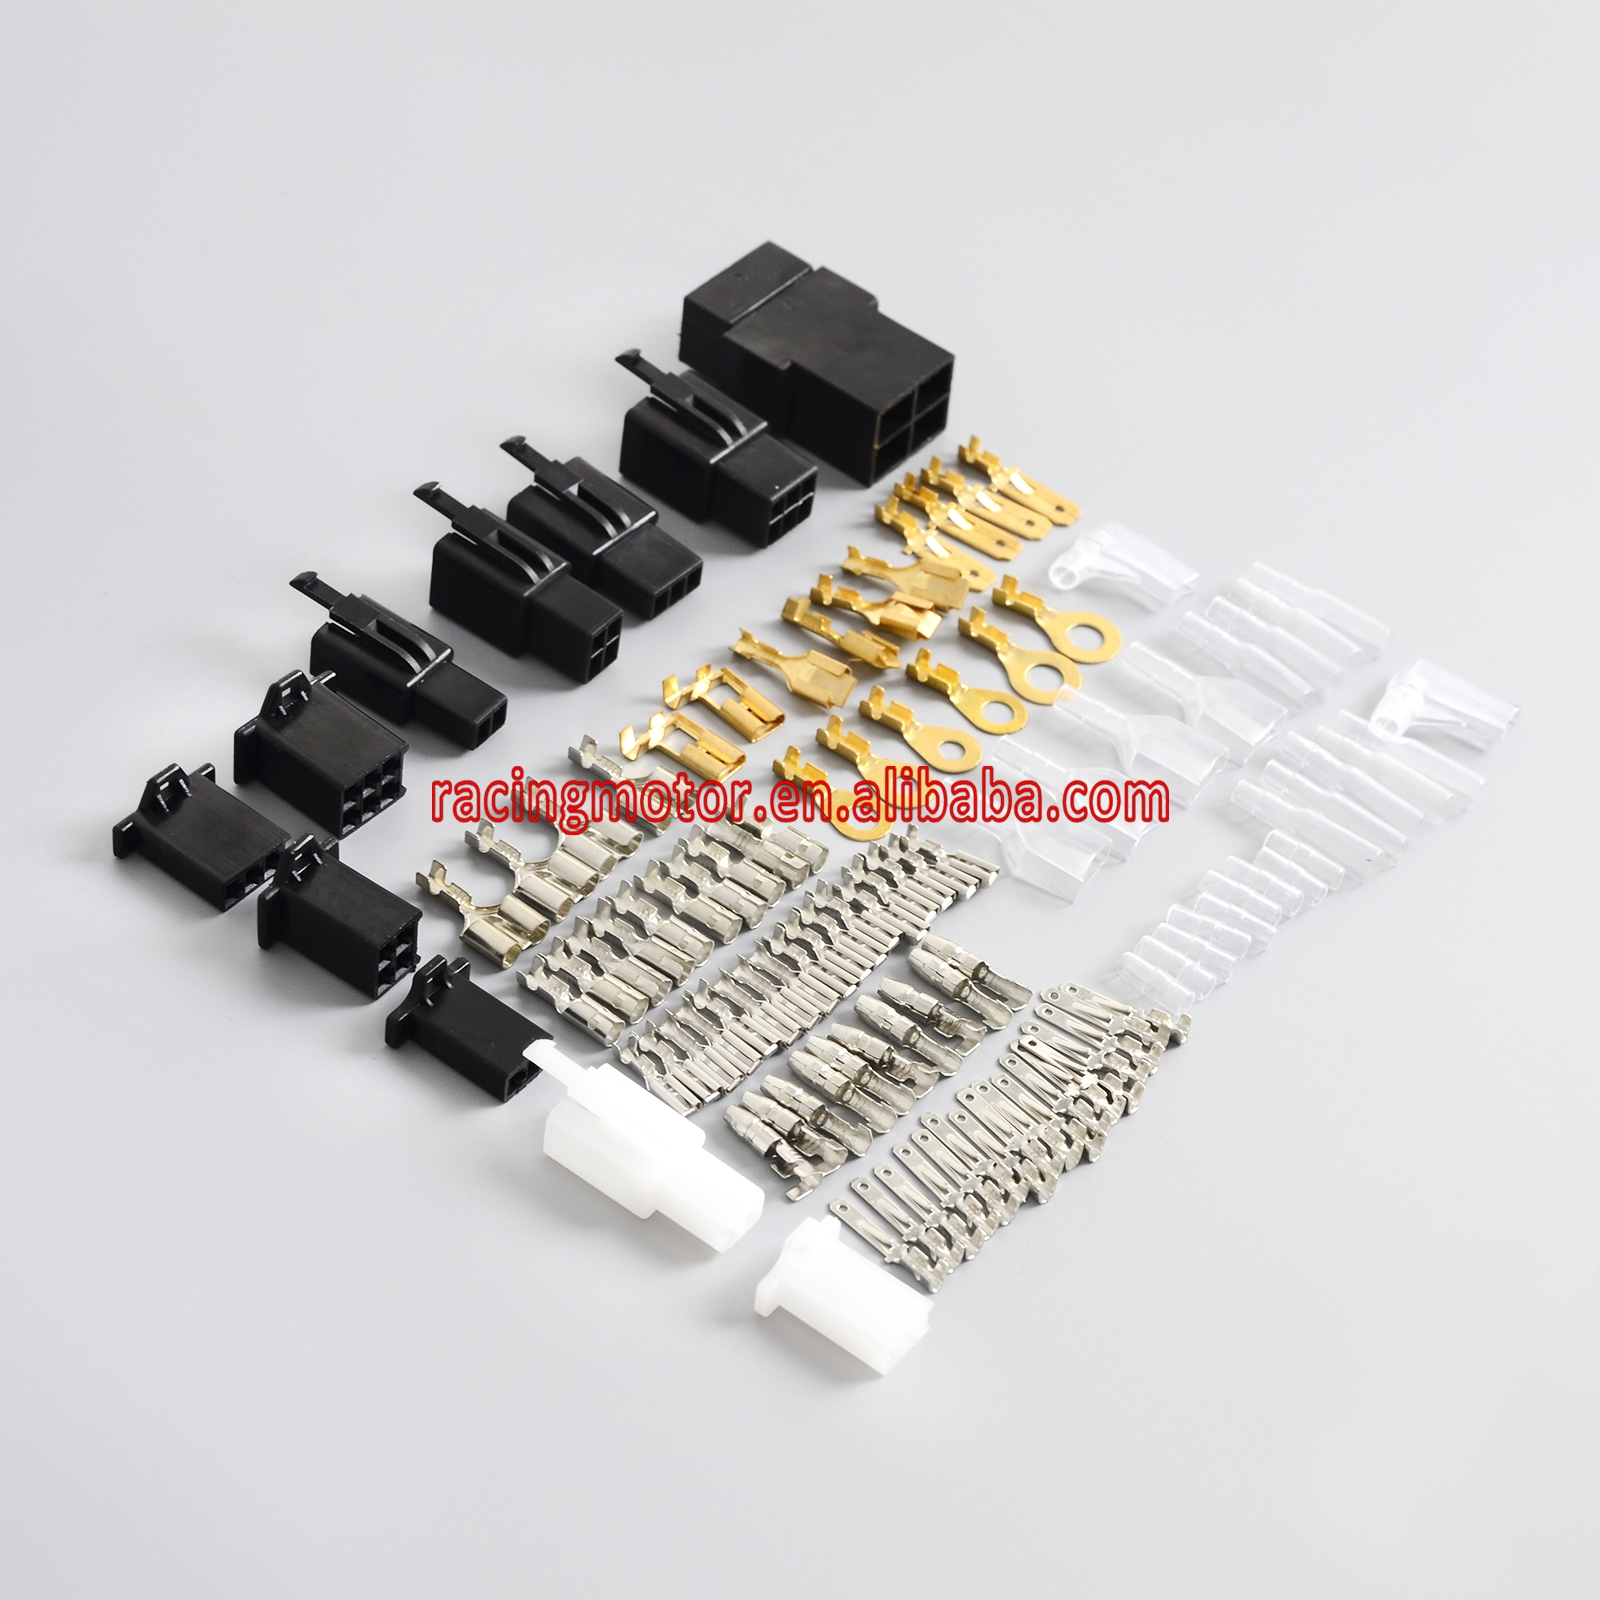 medium resolution of 4623 husqvarna wiring harness house wiring diagram symbols u2022 husqvarna rz4621 wiring diagram